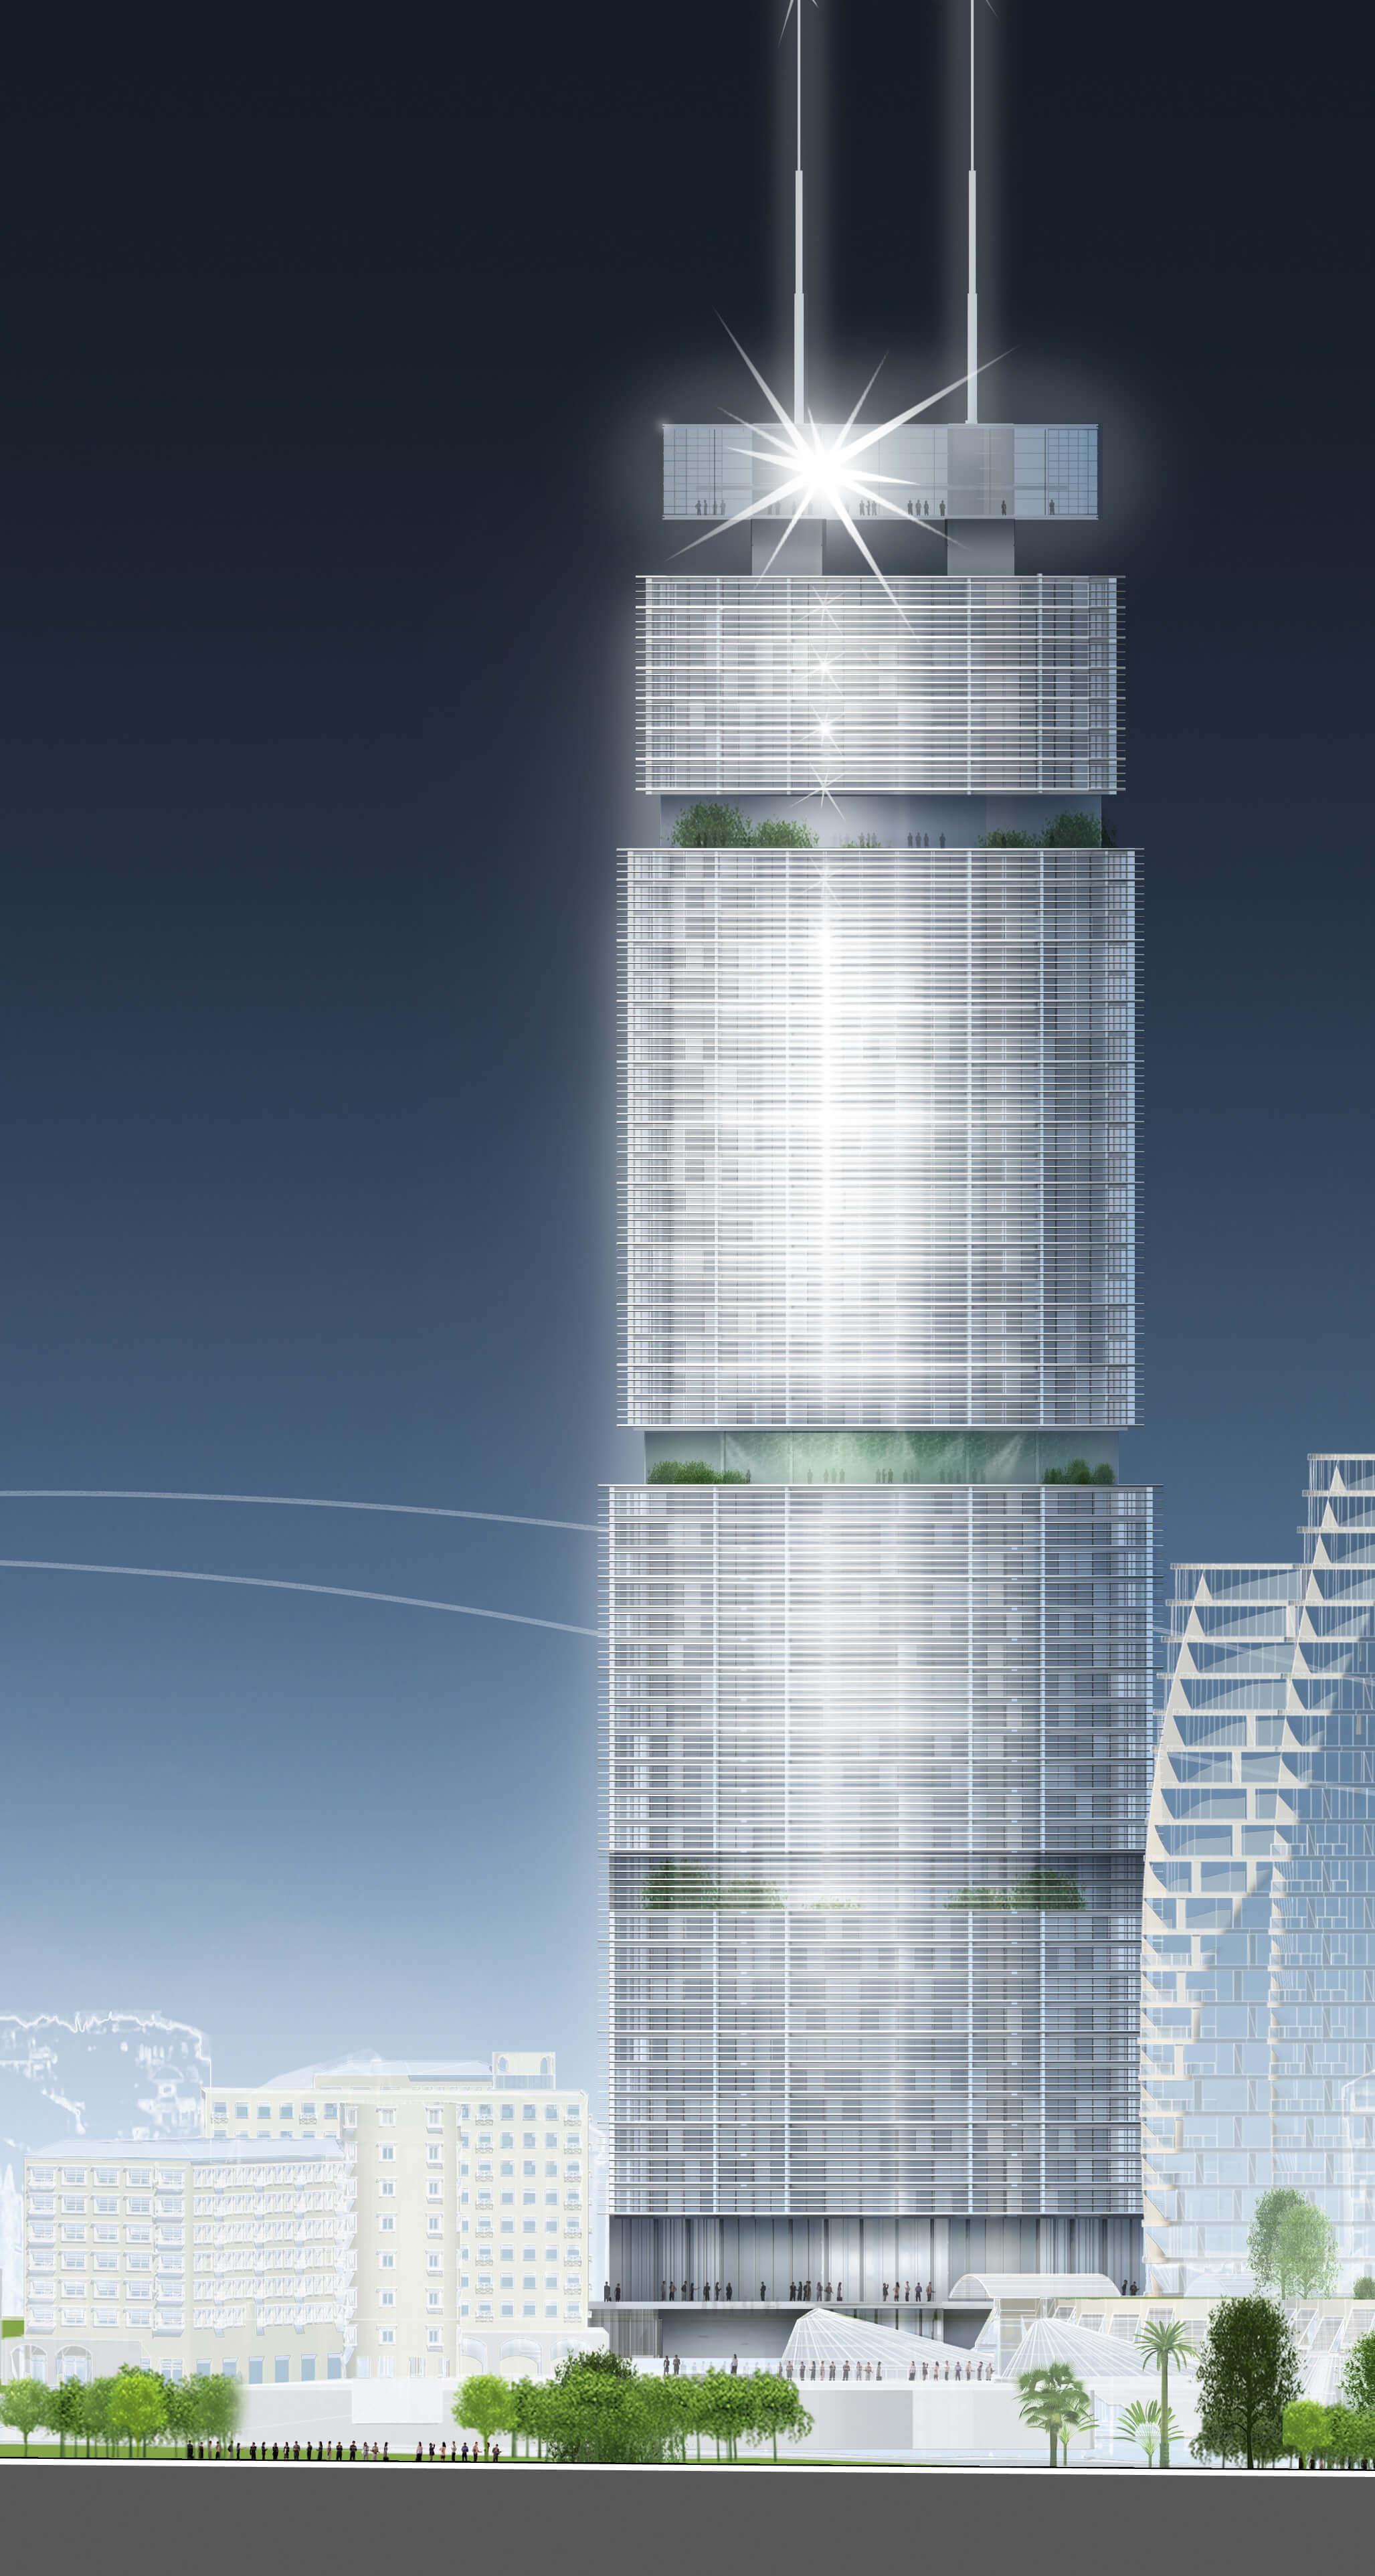 09-03-27_Final_Concept_Design_Report14